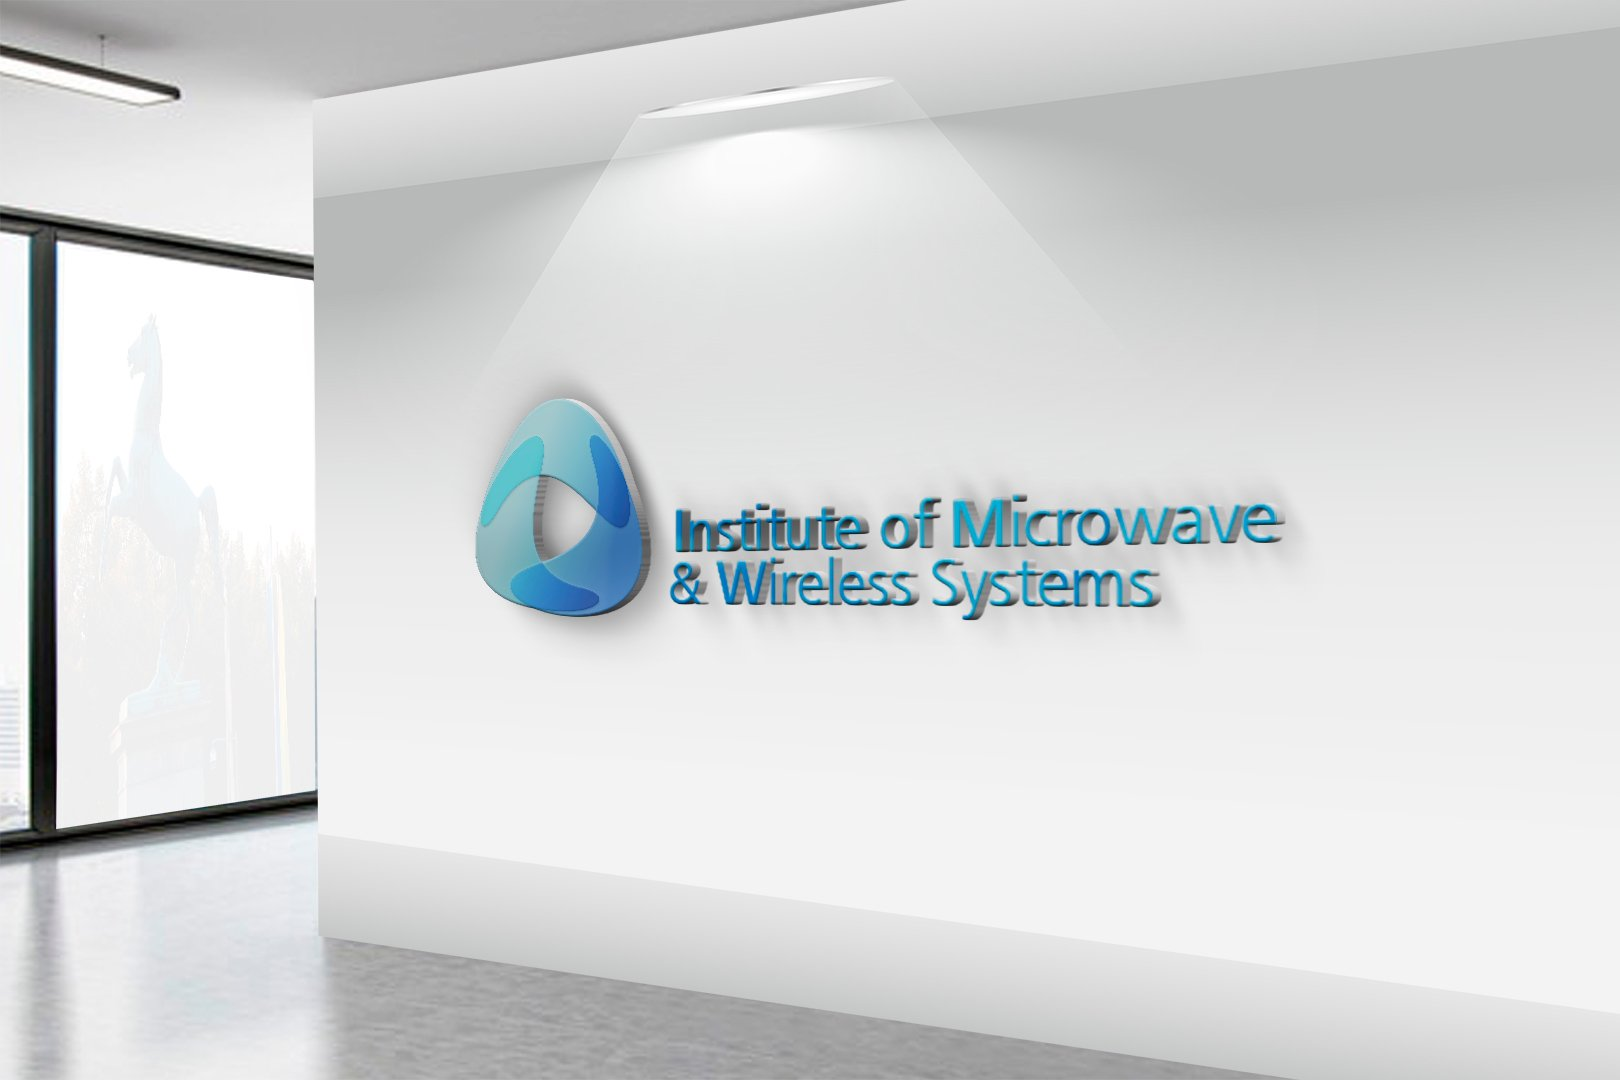 Institute of microwave